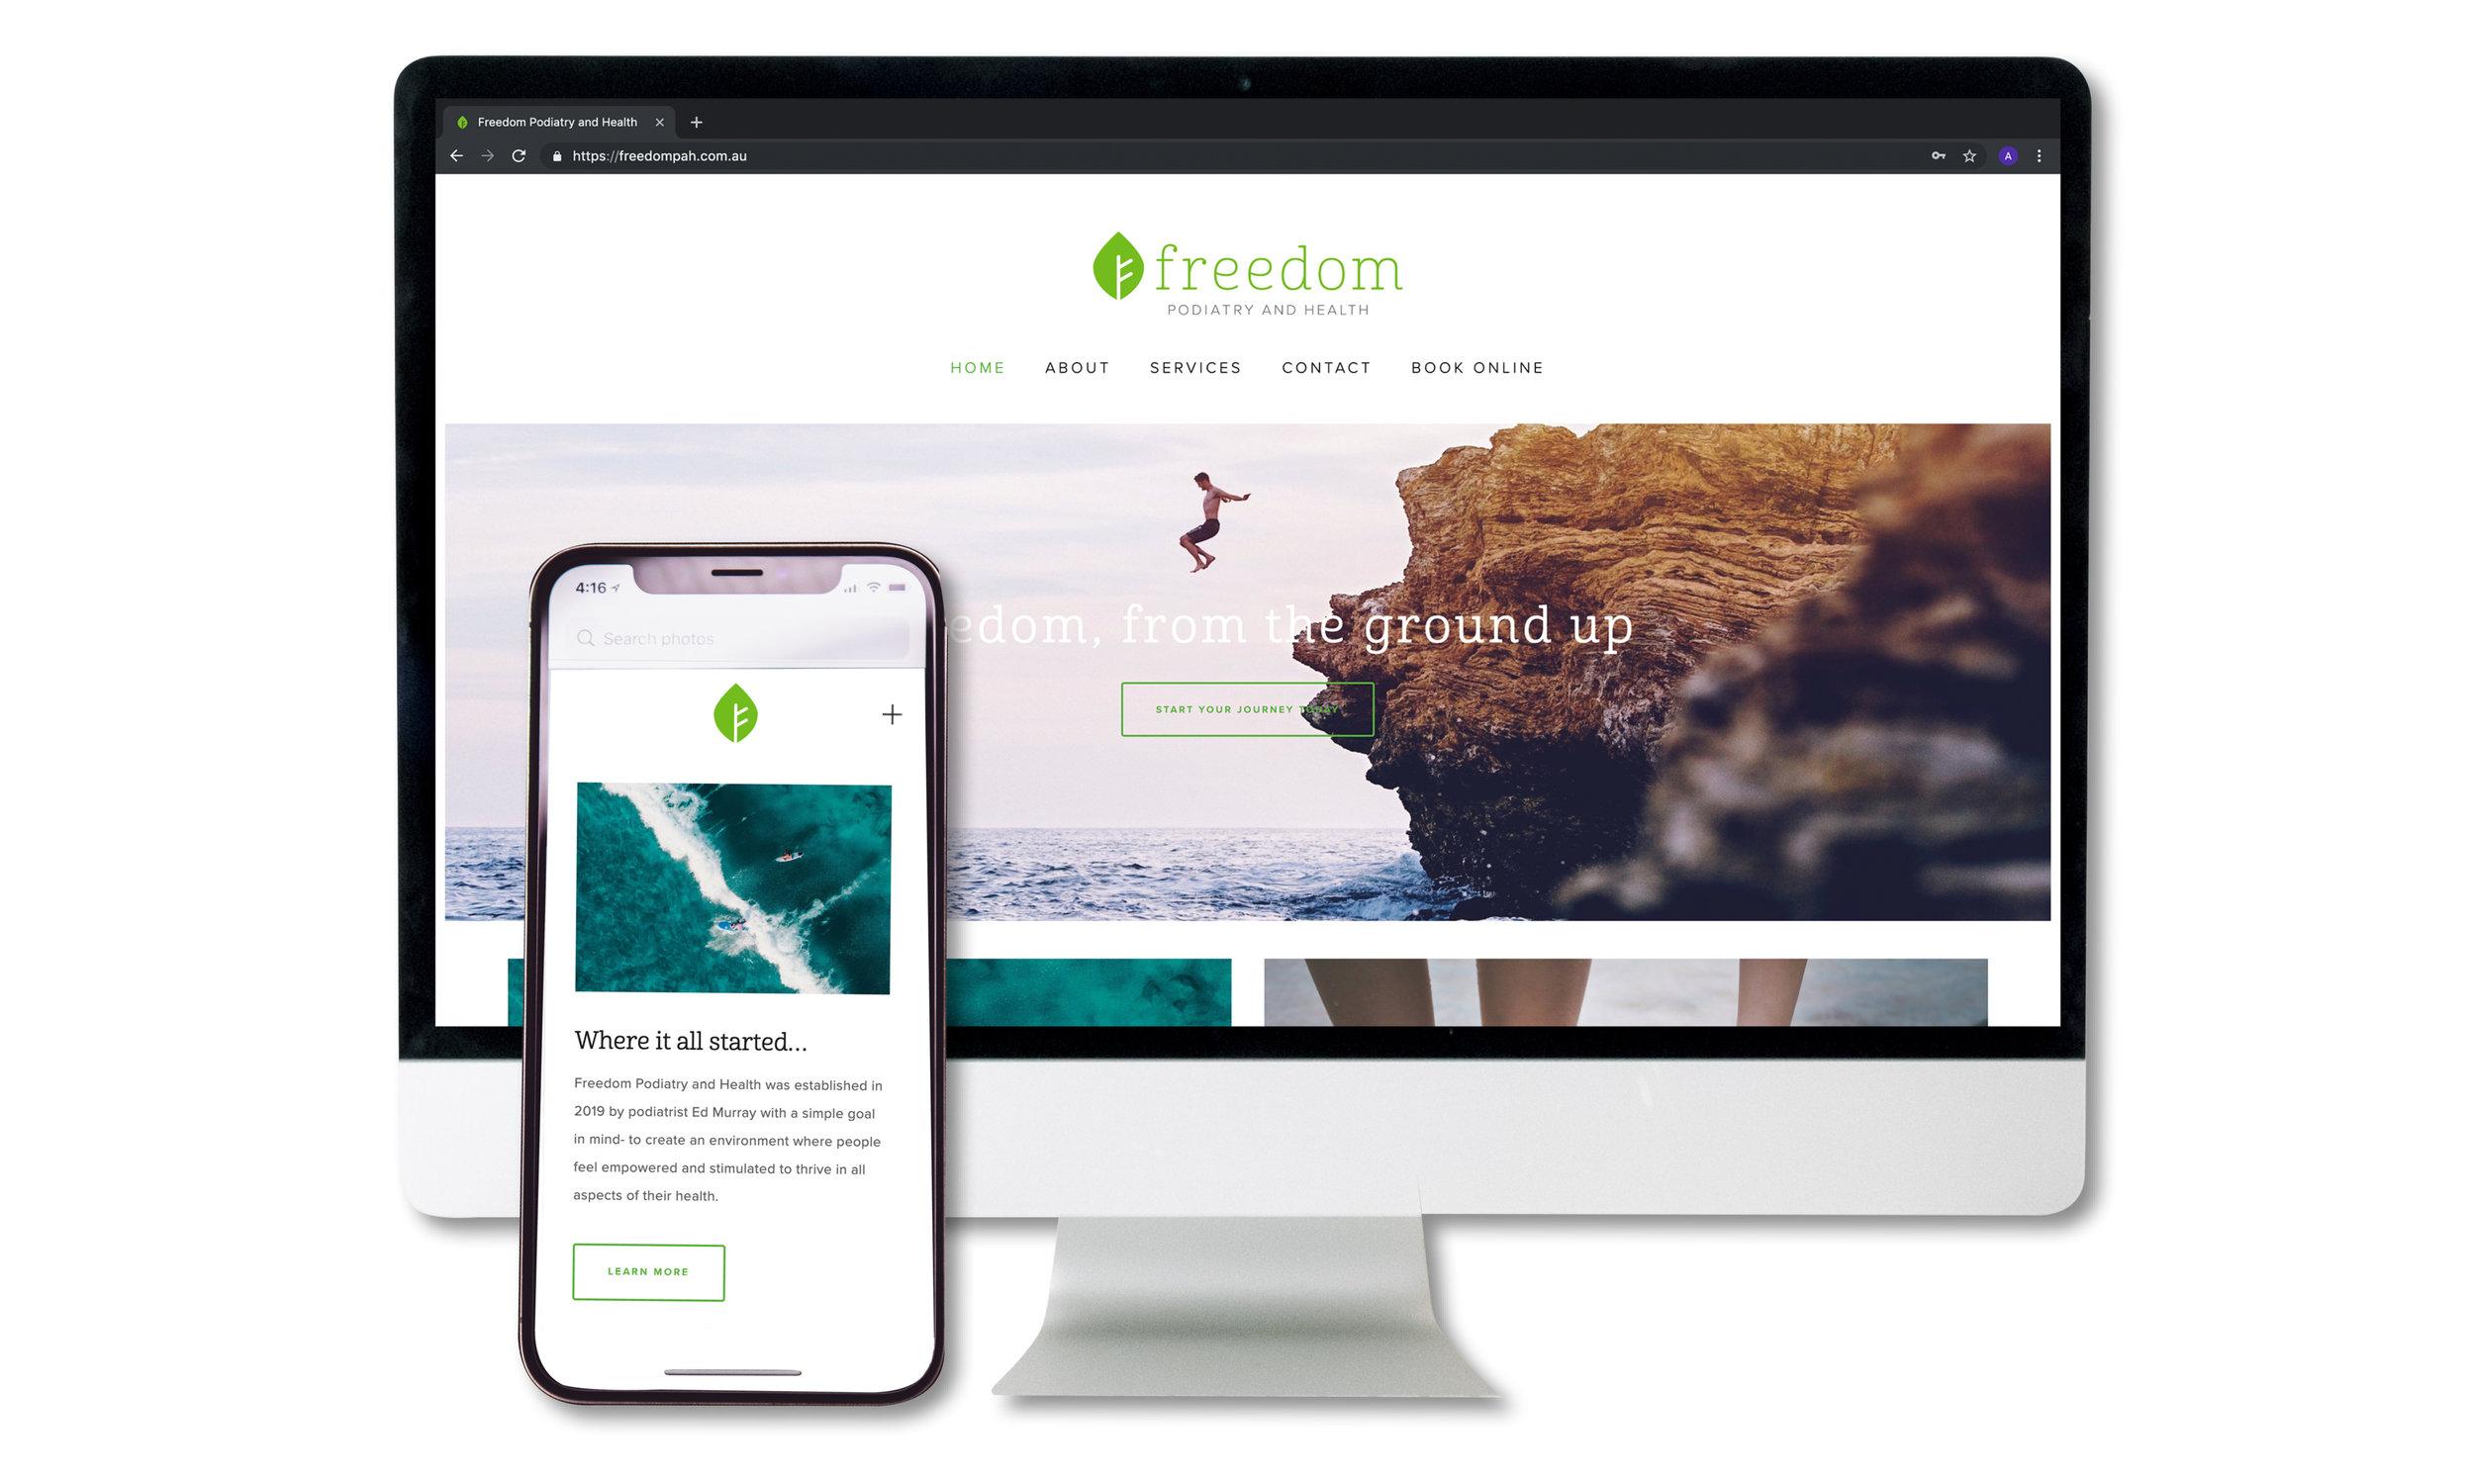 freedom_freedompage.jpg